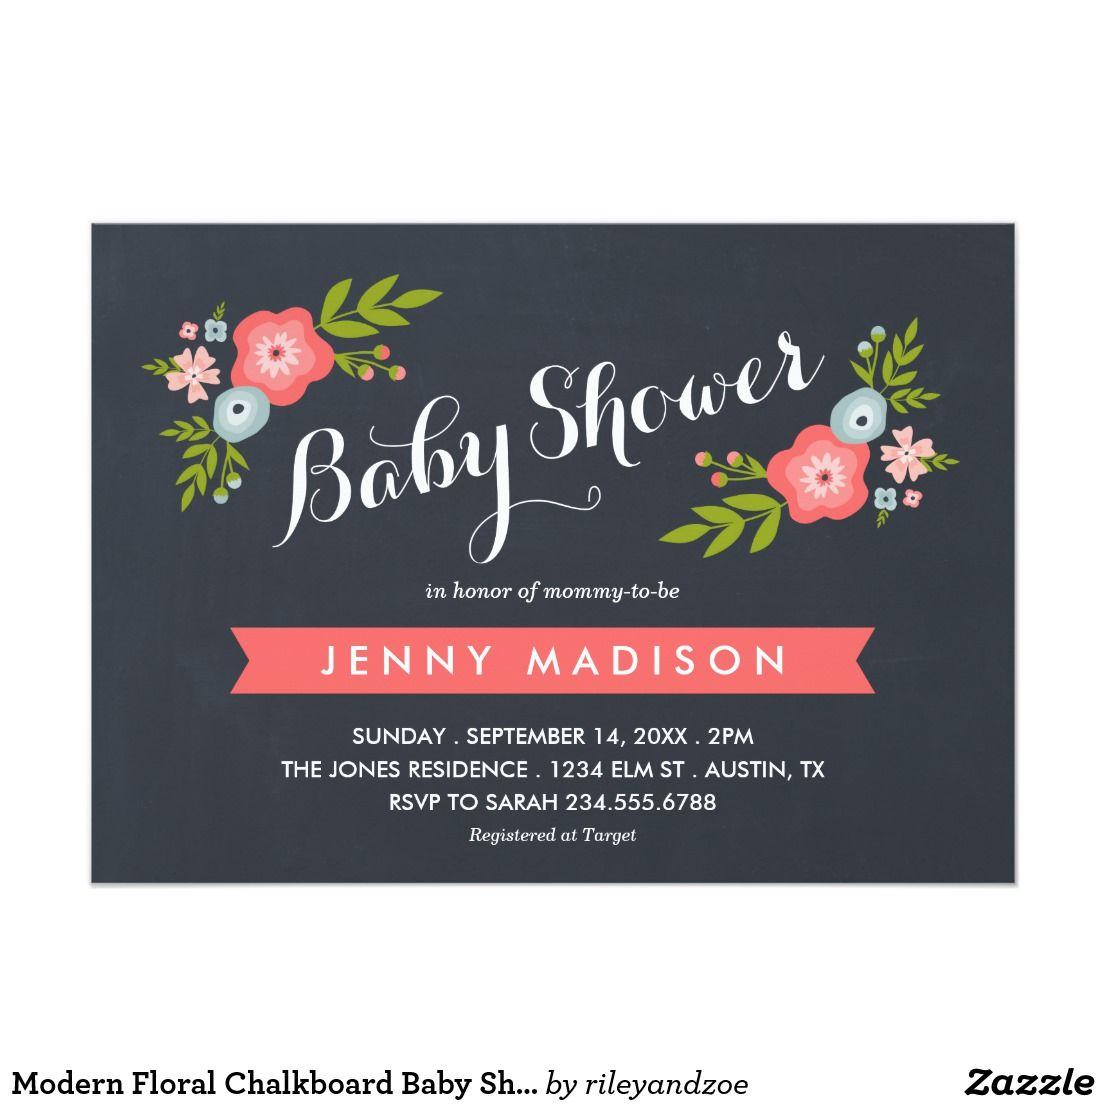 Modern floral chalkboard baby shower invitation chalkboard baby modern floral chalkboard baby shower invitation filmwisefo